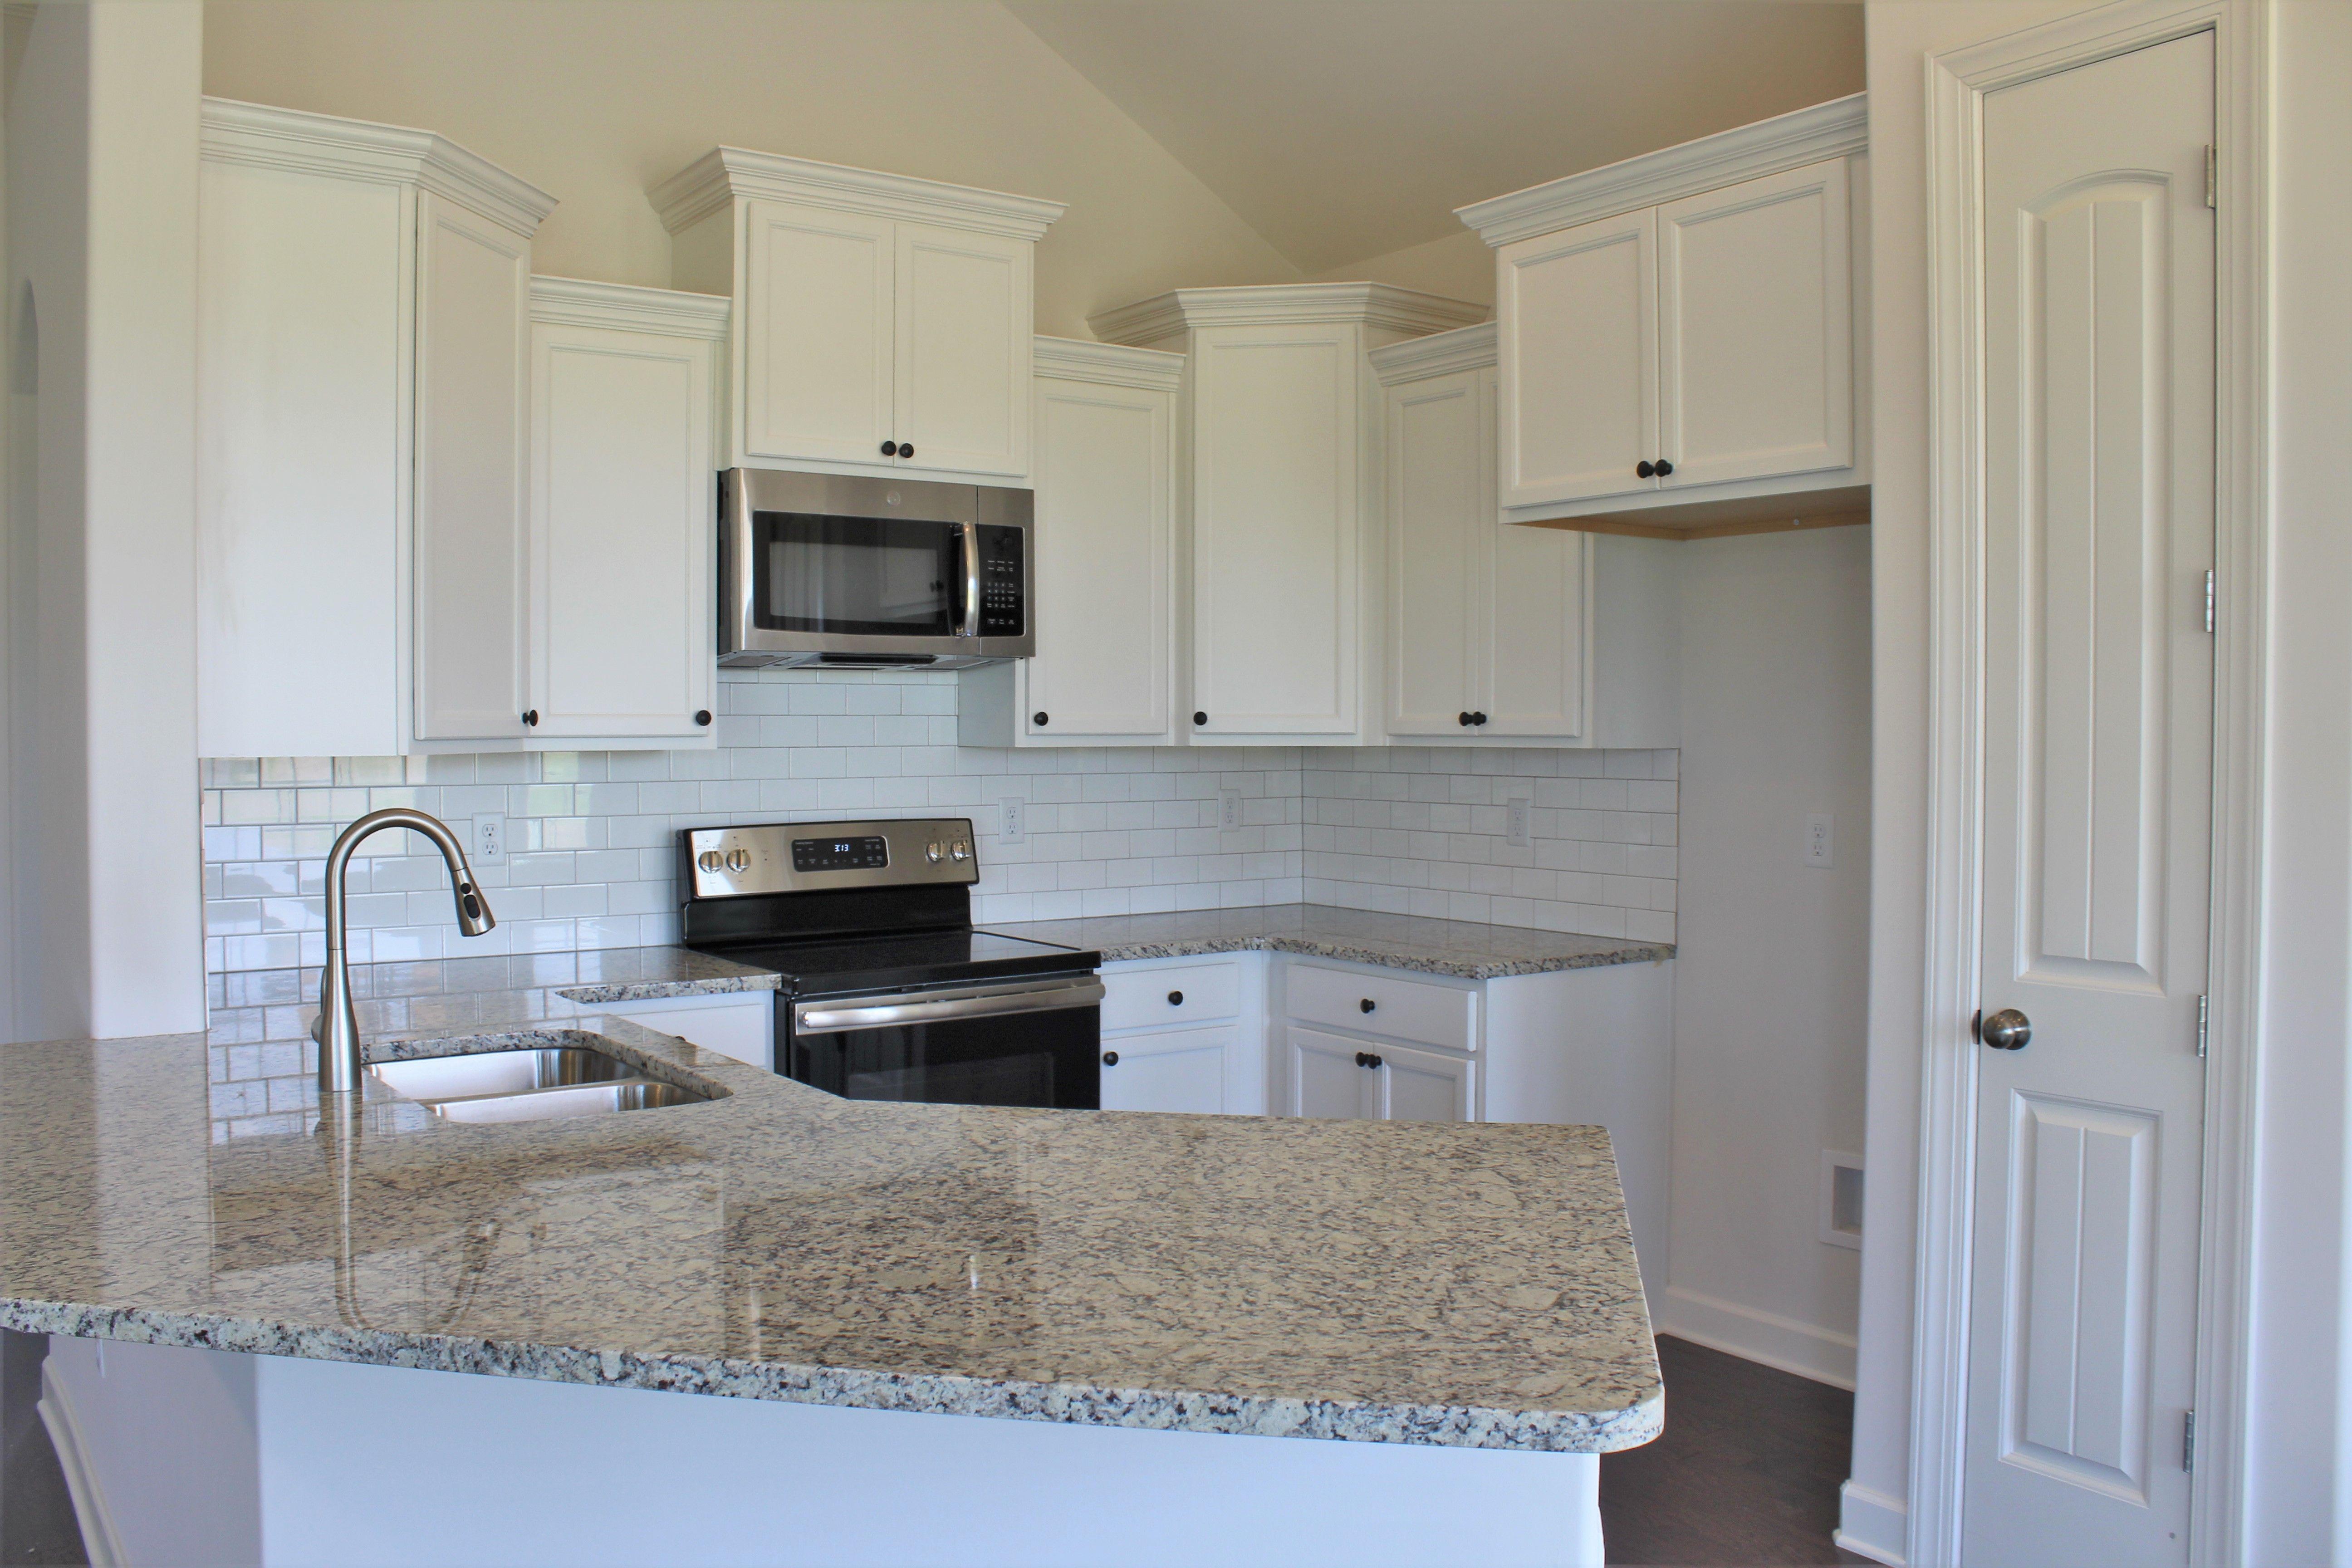 Kitchen featured in the Henderson By Regency Homebuilders in Memphis, TN